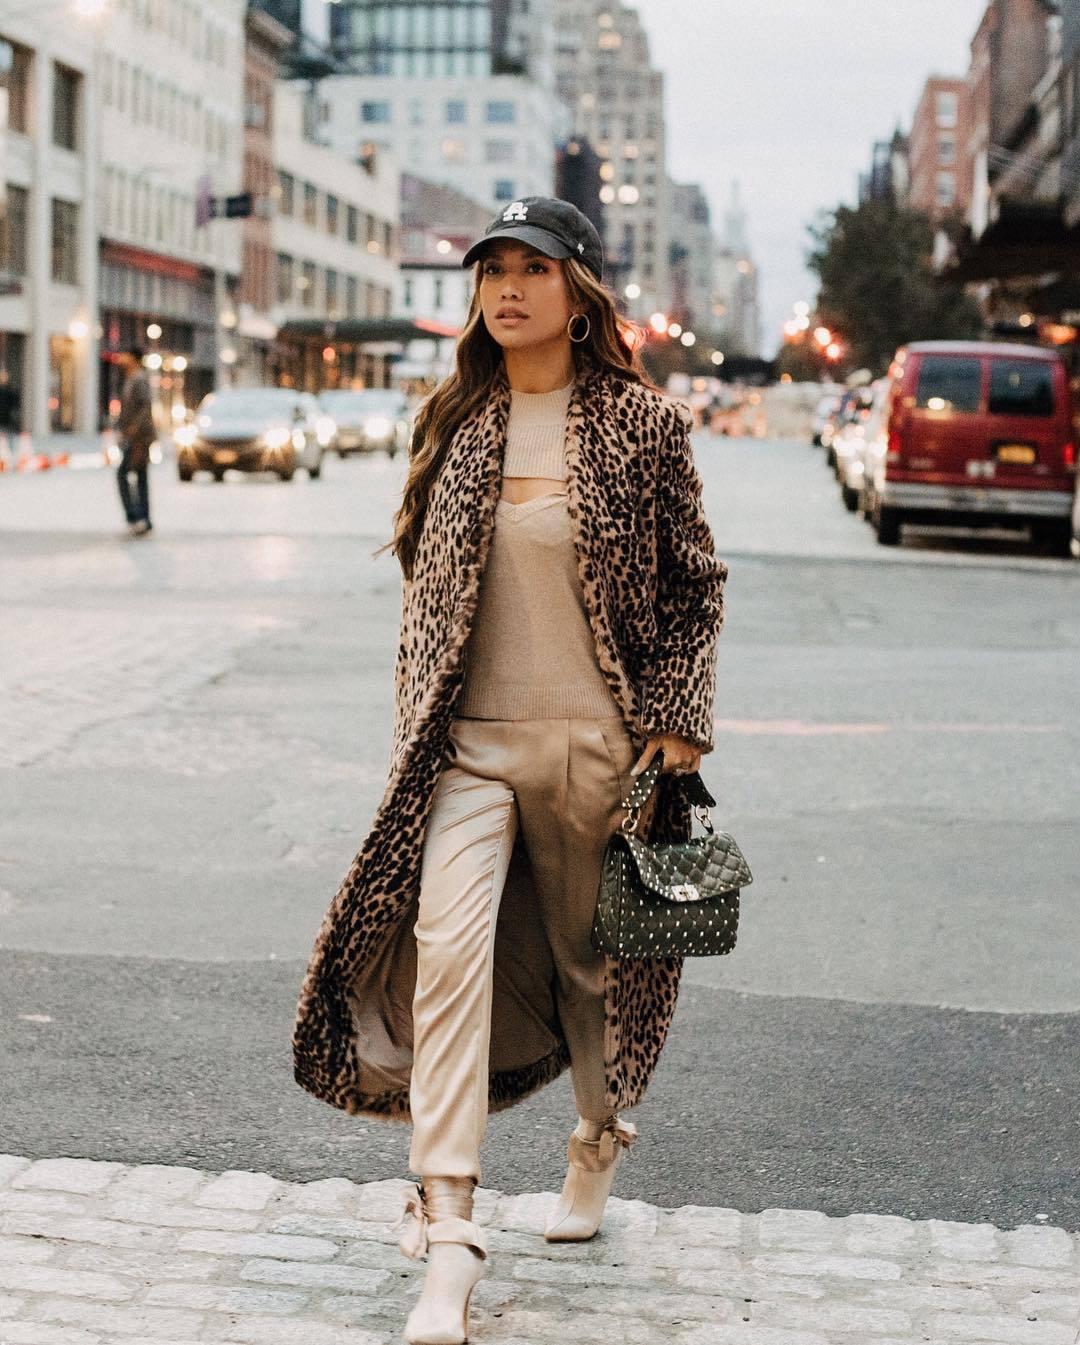 coat long coat leopard print ankle boots heel boots silk pants black bag handbag knitted top cap